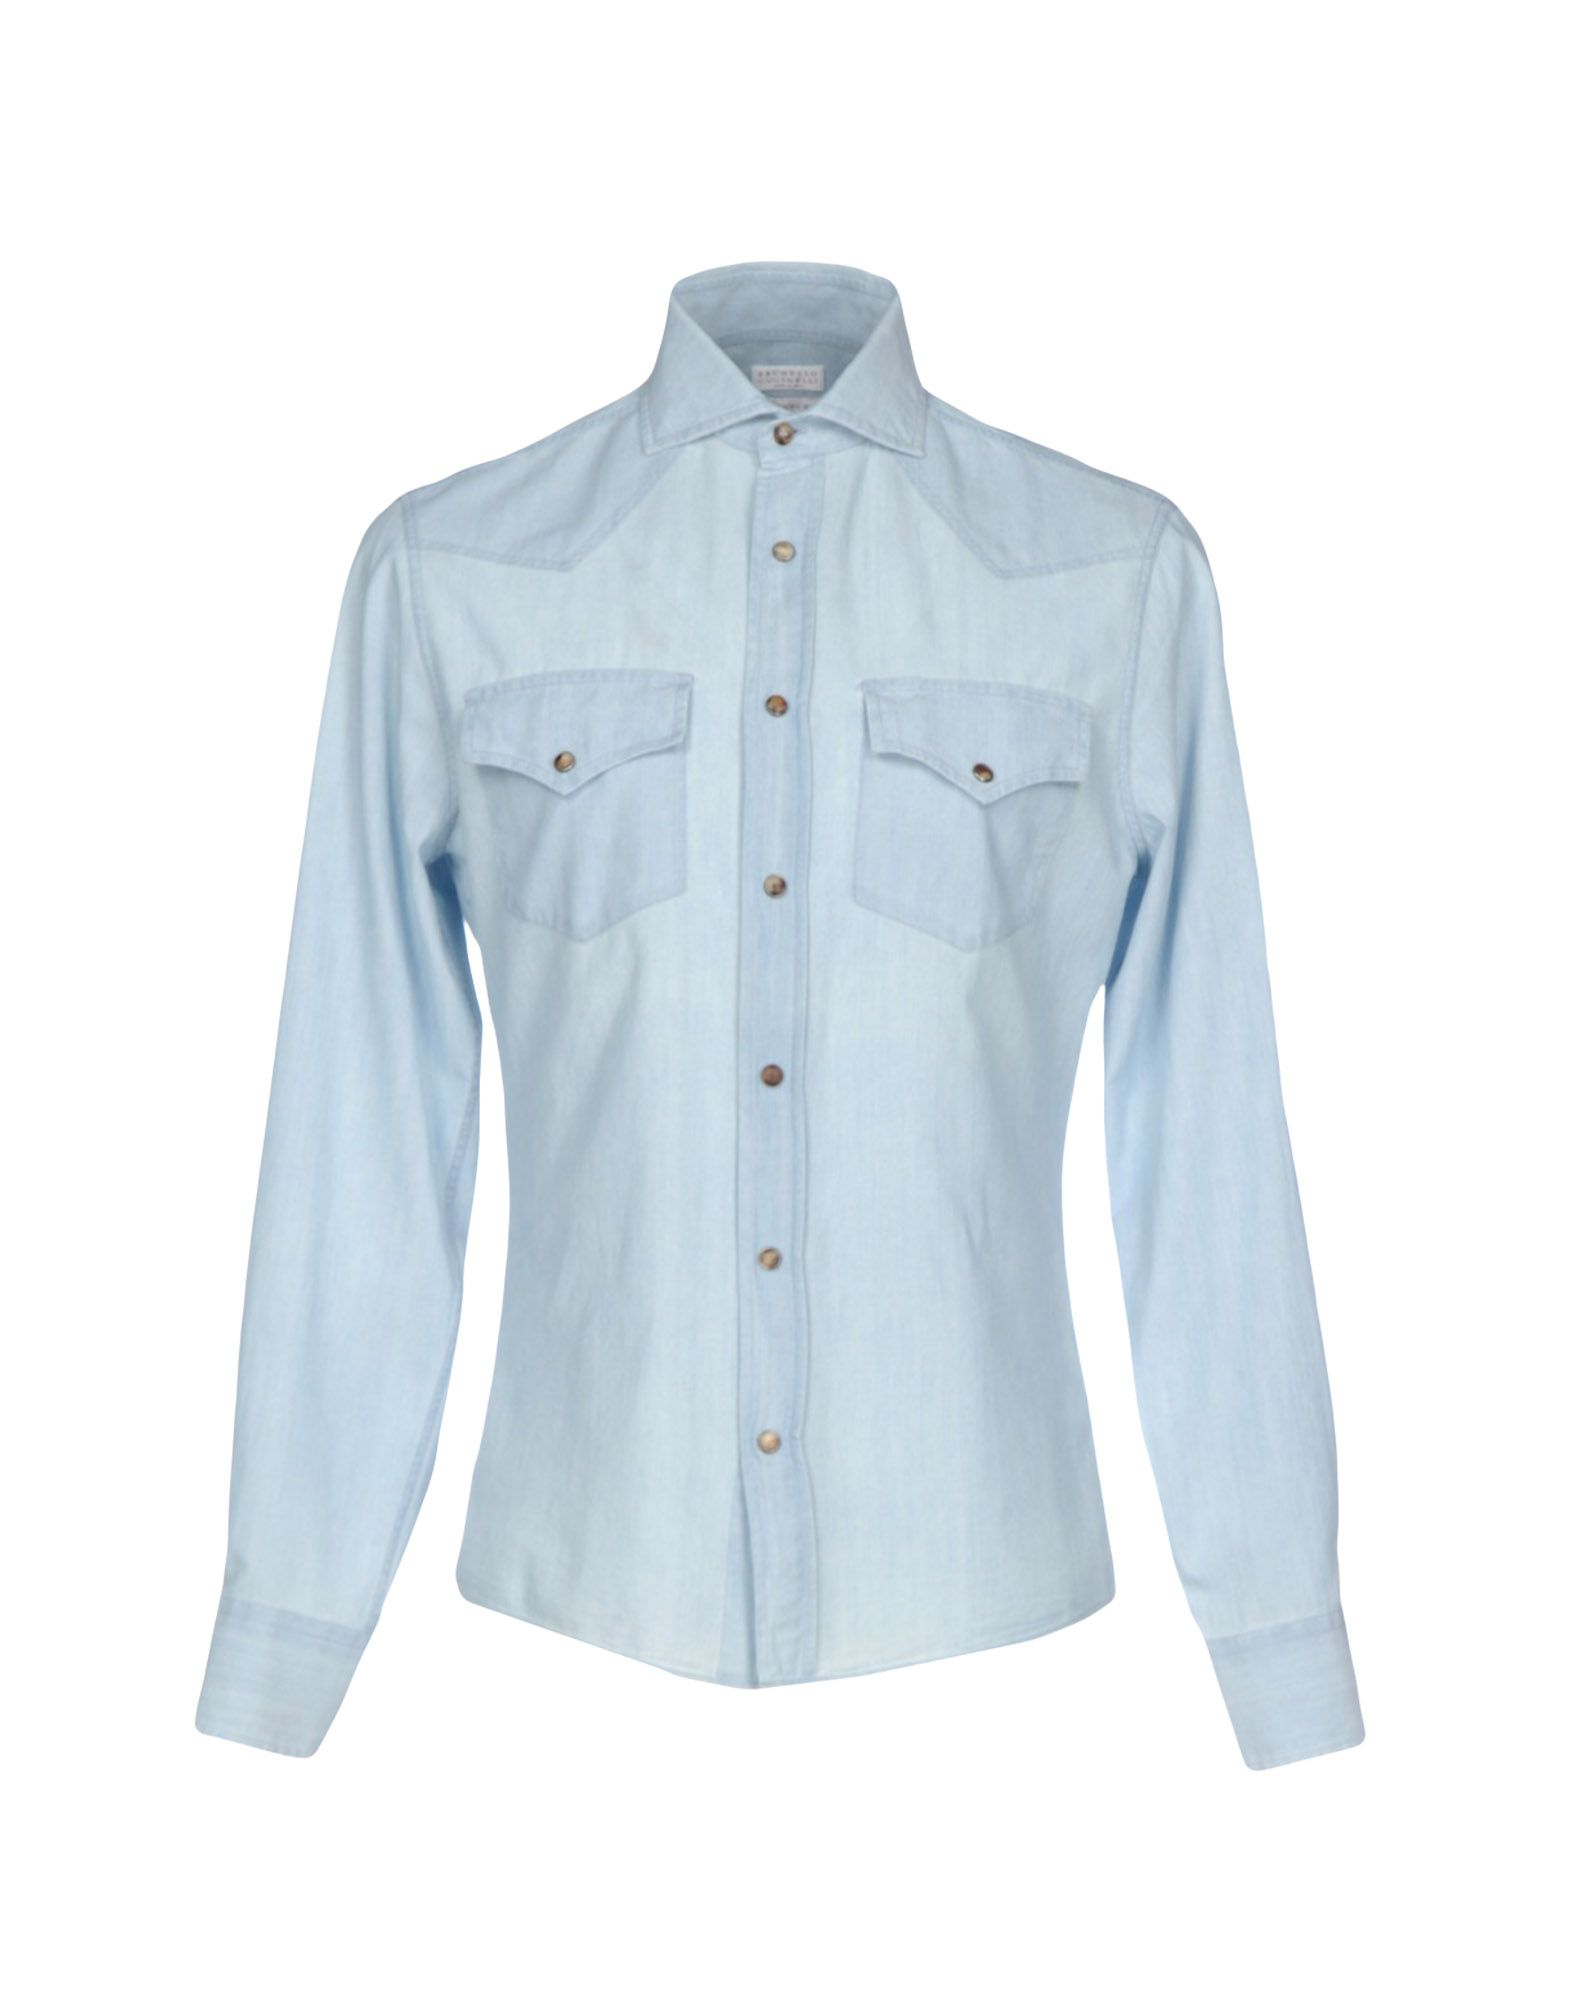 BRUNELLO CUCINELLI Джинсовая рубашка рубашка джинсовая с рисунком сердце 3 12 лет